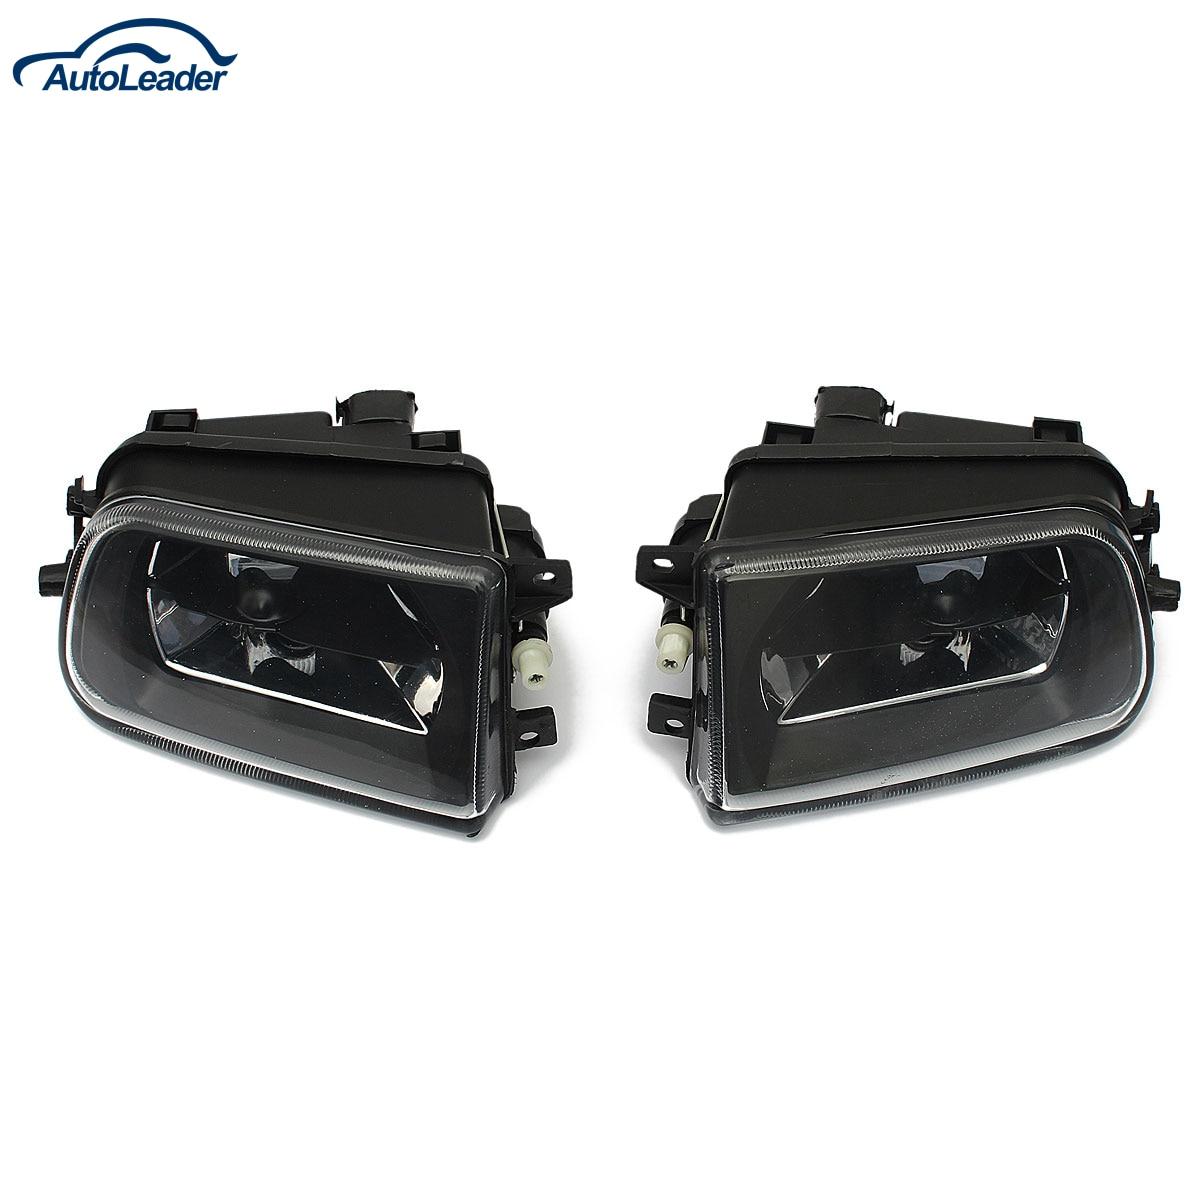 1 Pair Car Fog Lights Driving Spot Lamps Black Housing For BMW E39 5 SERIES Z3 1997-2000<br><br>Aliexpress